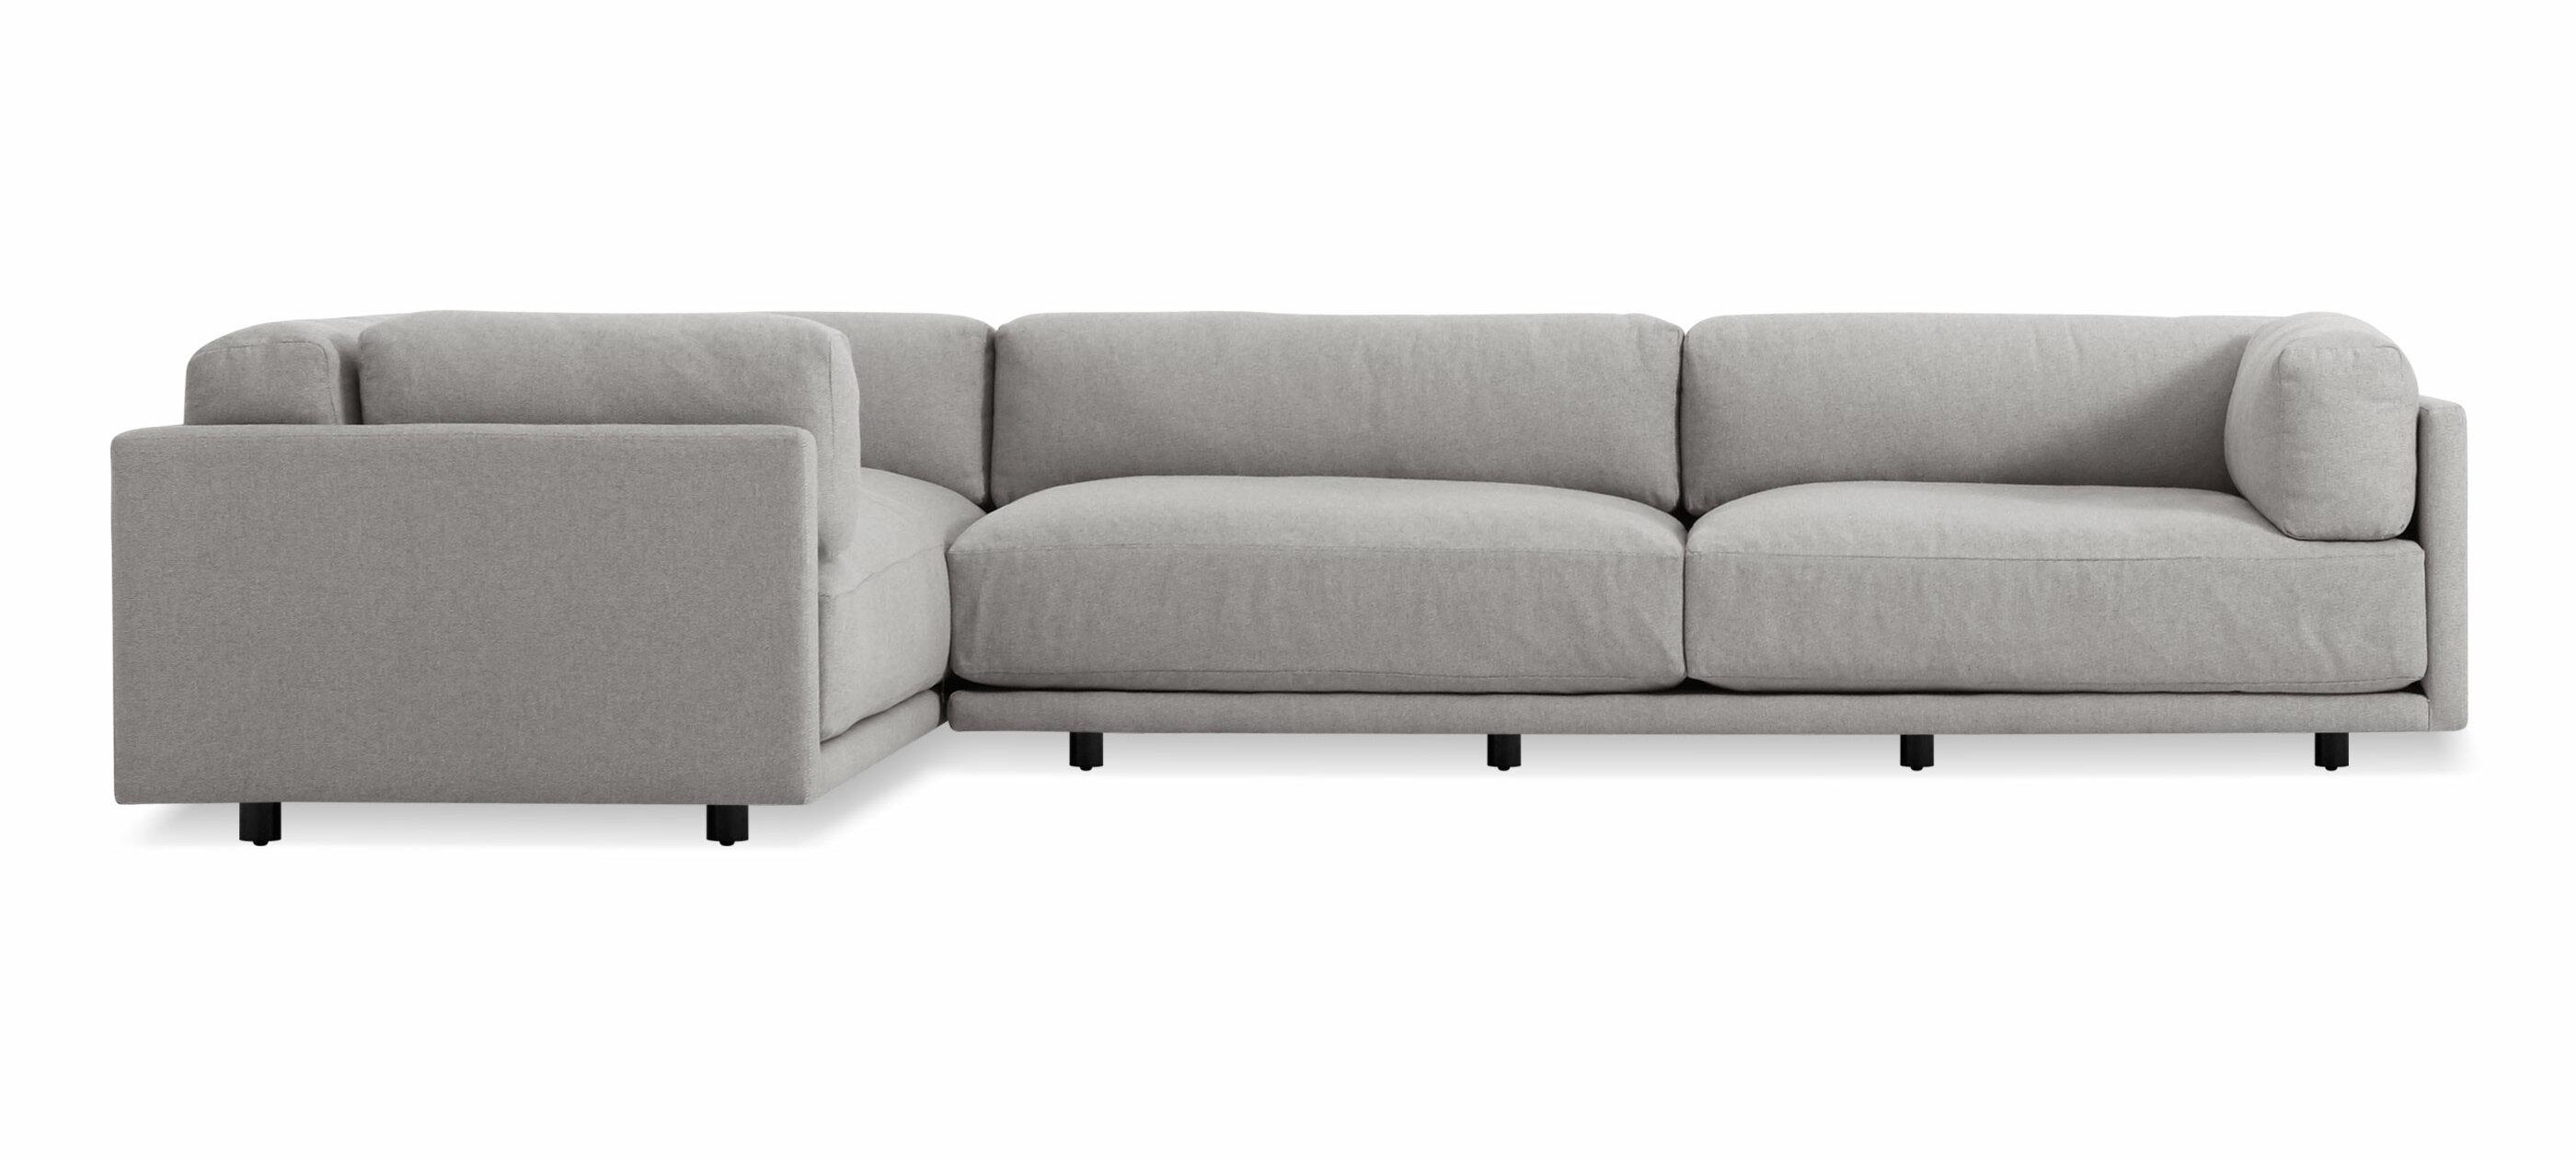 Blu Dot Sunday Right L Sectional Sofa